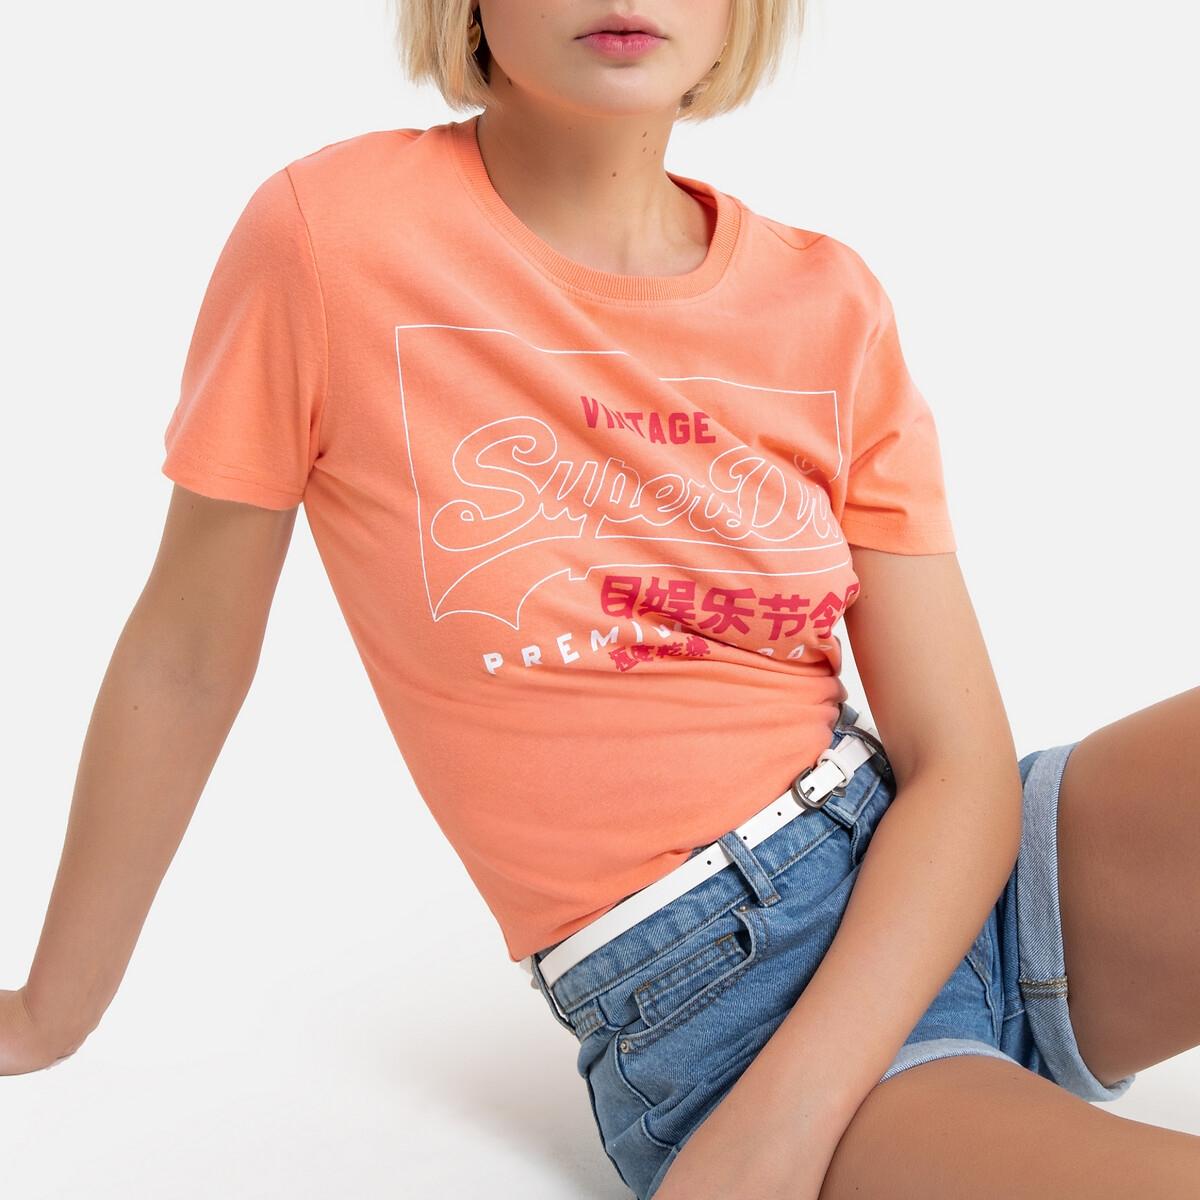 Camiseta de algodón de manga corta, con logotipo